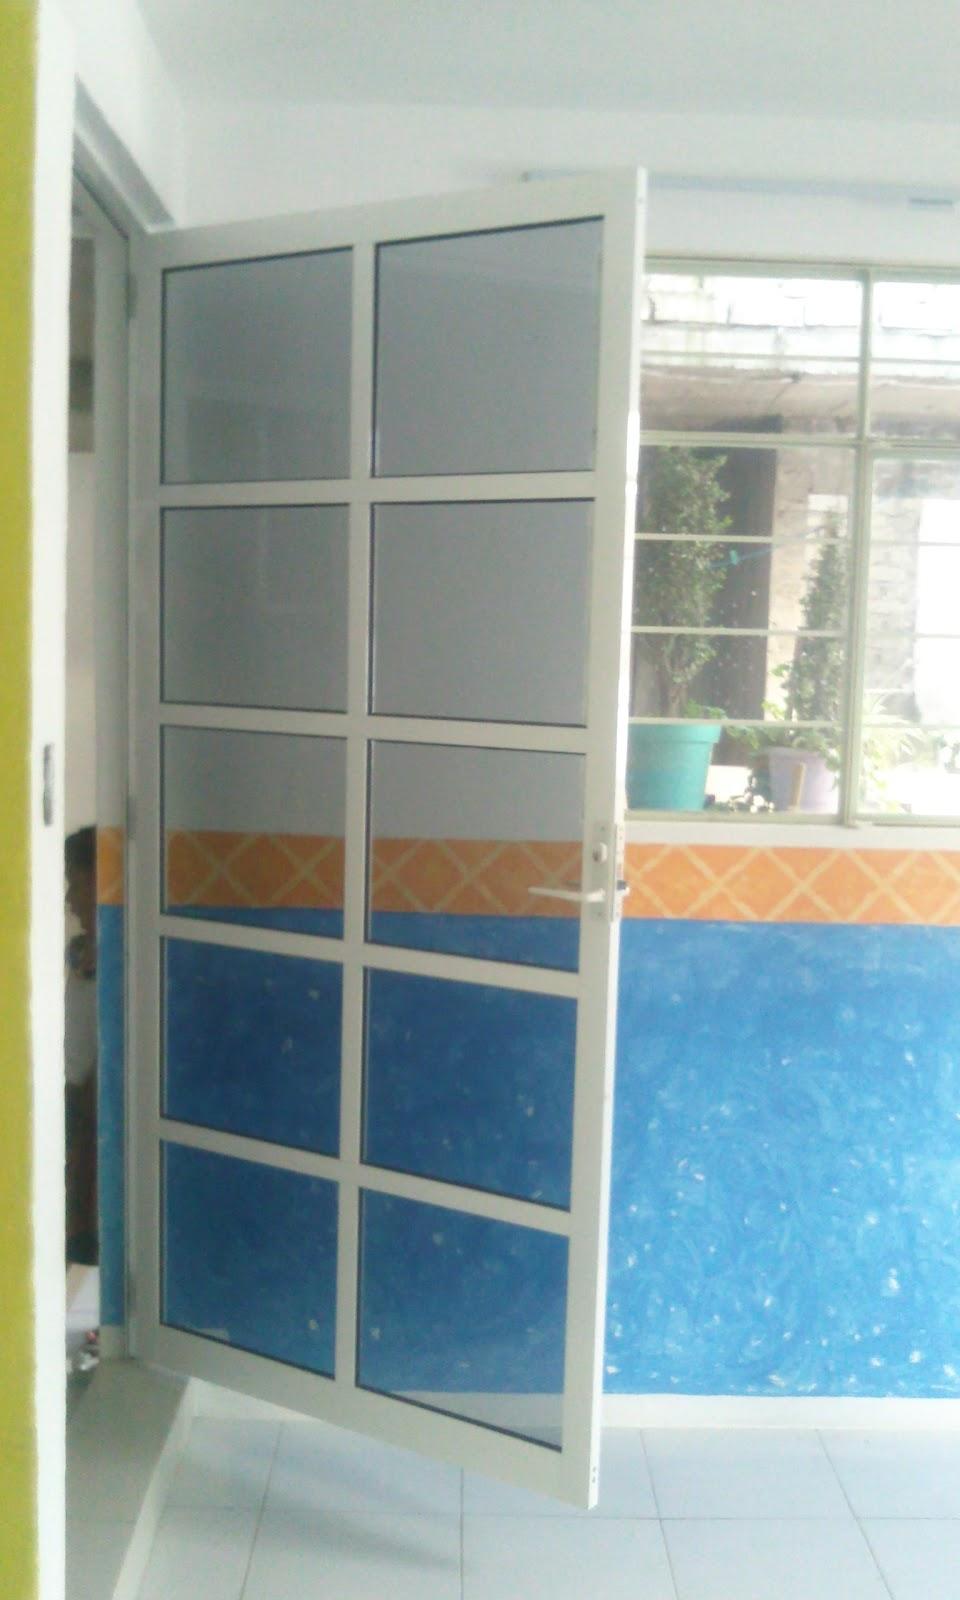 Precio puerta aluminio blanco perfect ventana aluminio for Precio puerta roble